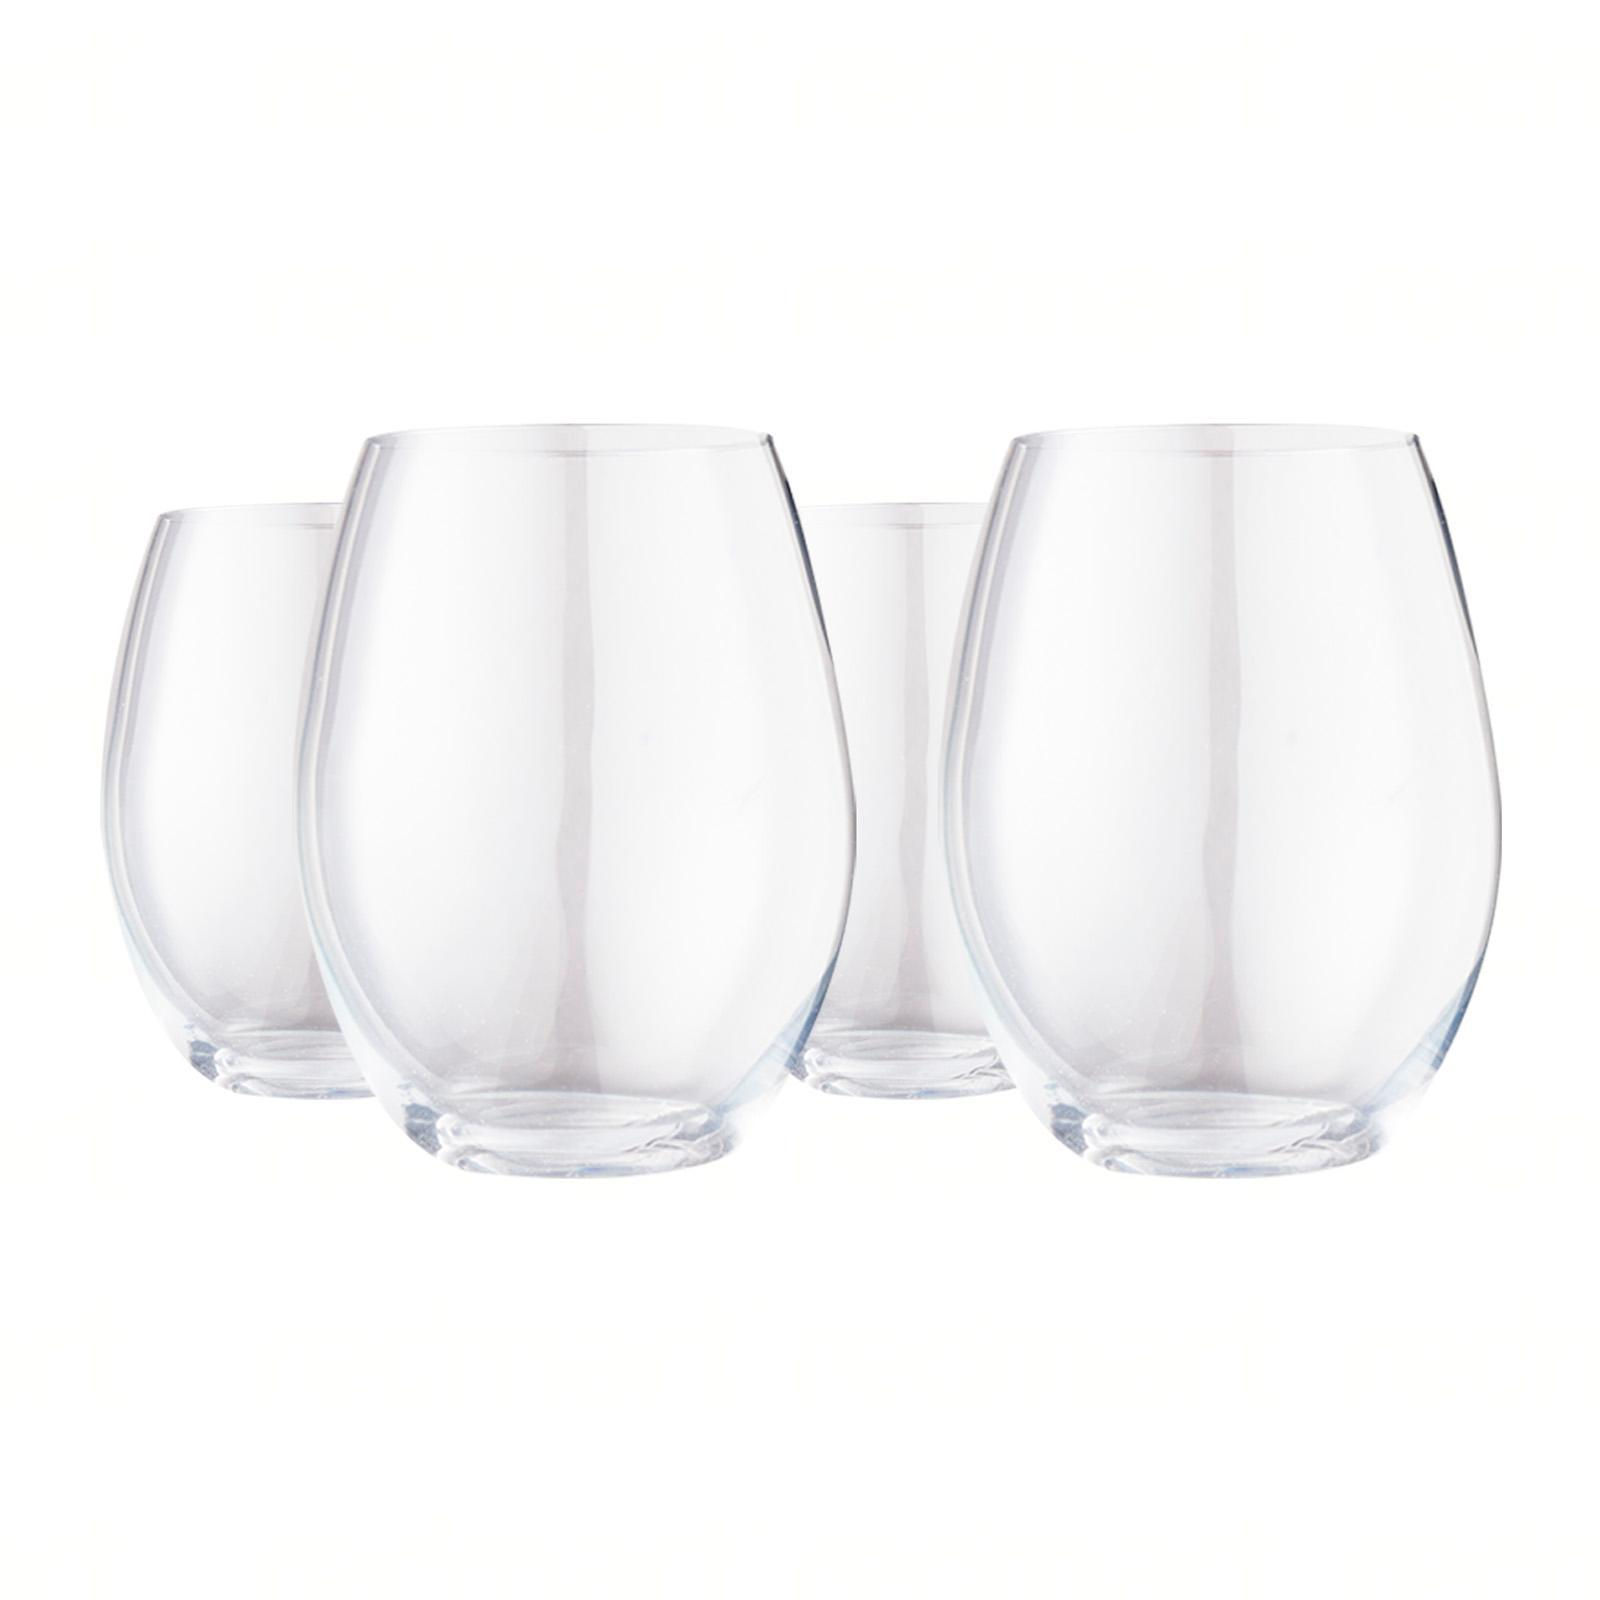 Plumm Crystal Wine Glasses - Stemless Red+ (4 Glasses)